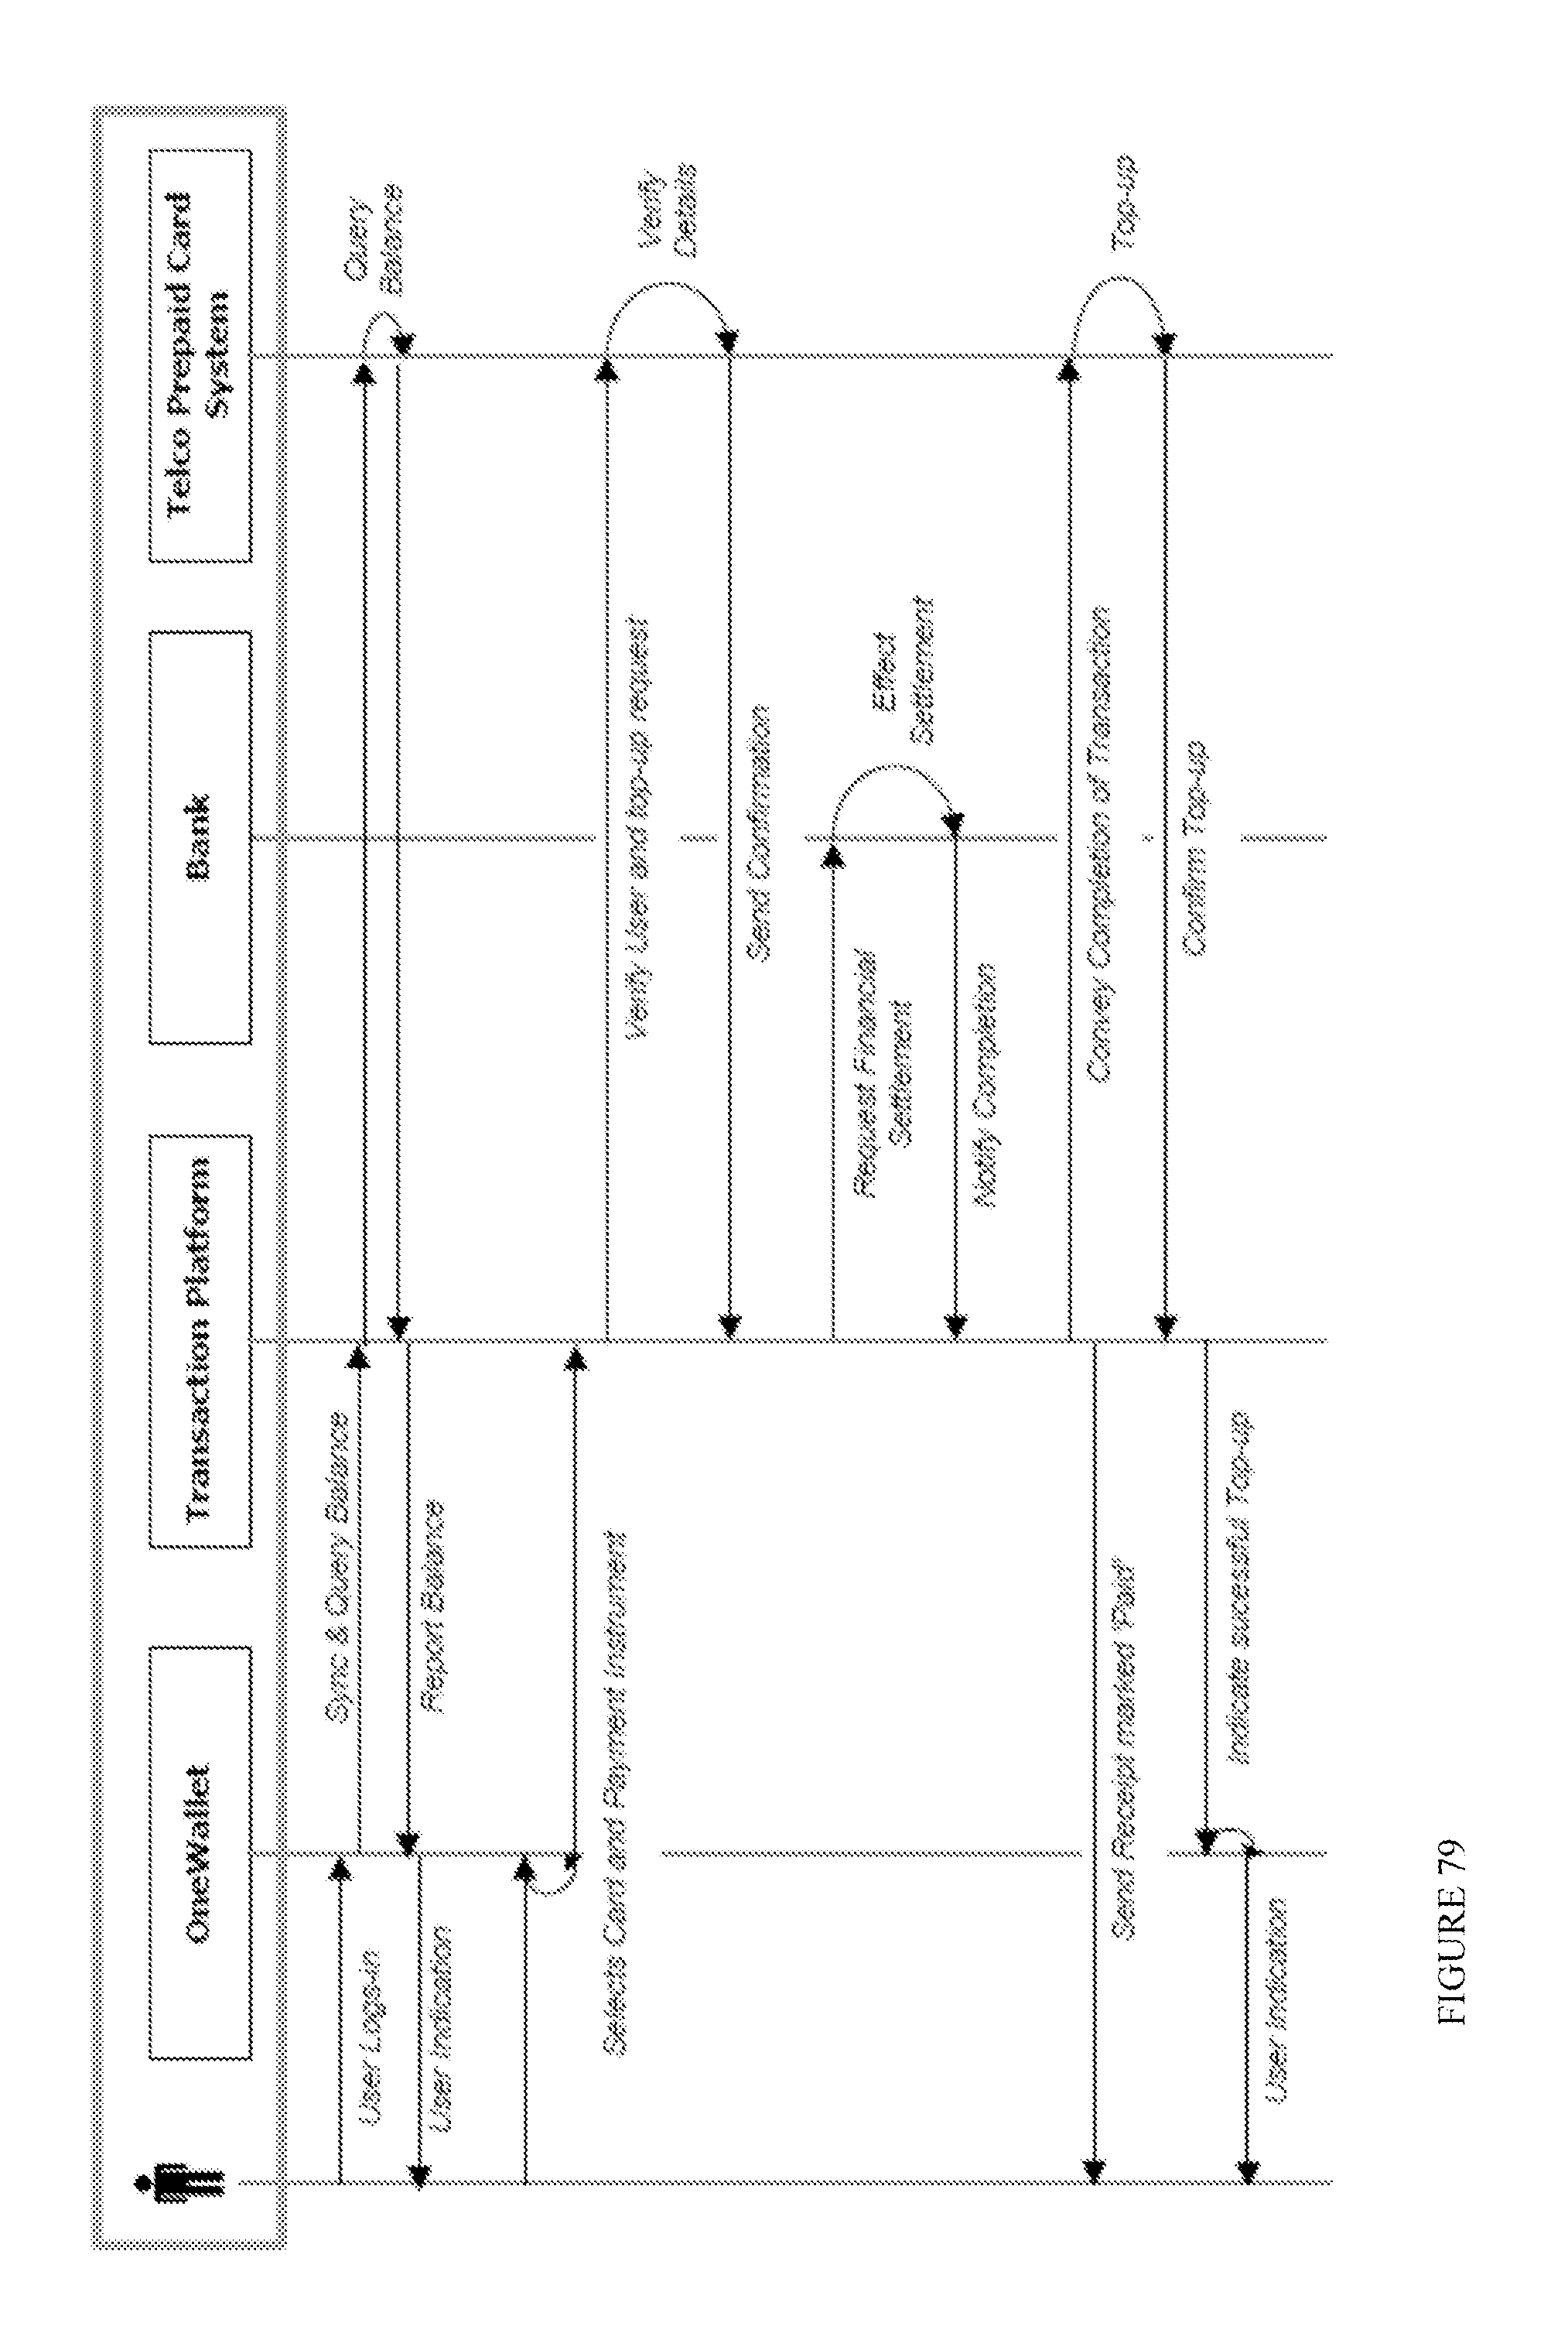 Patent US 20070198432A1